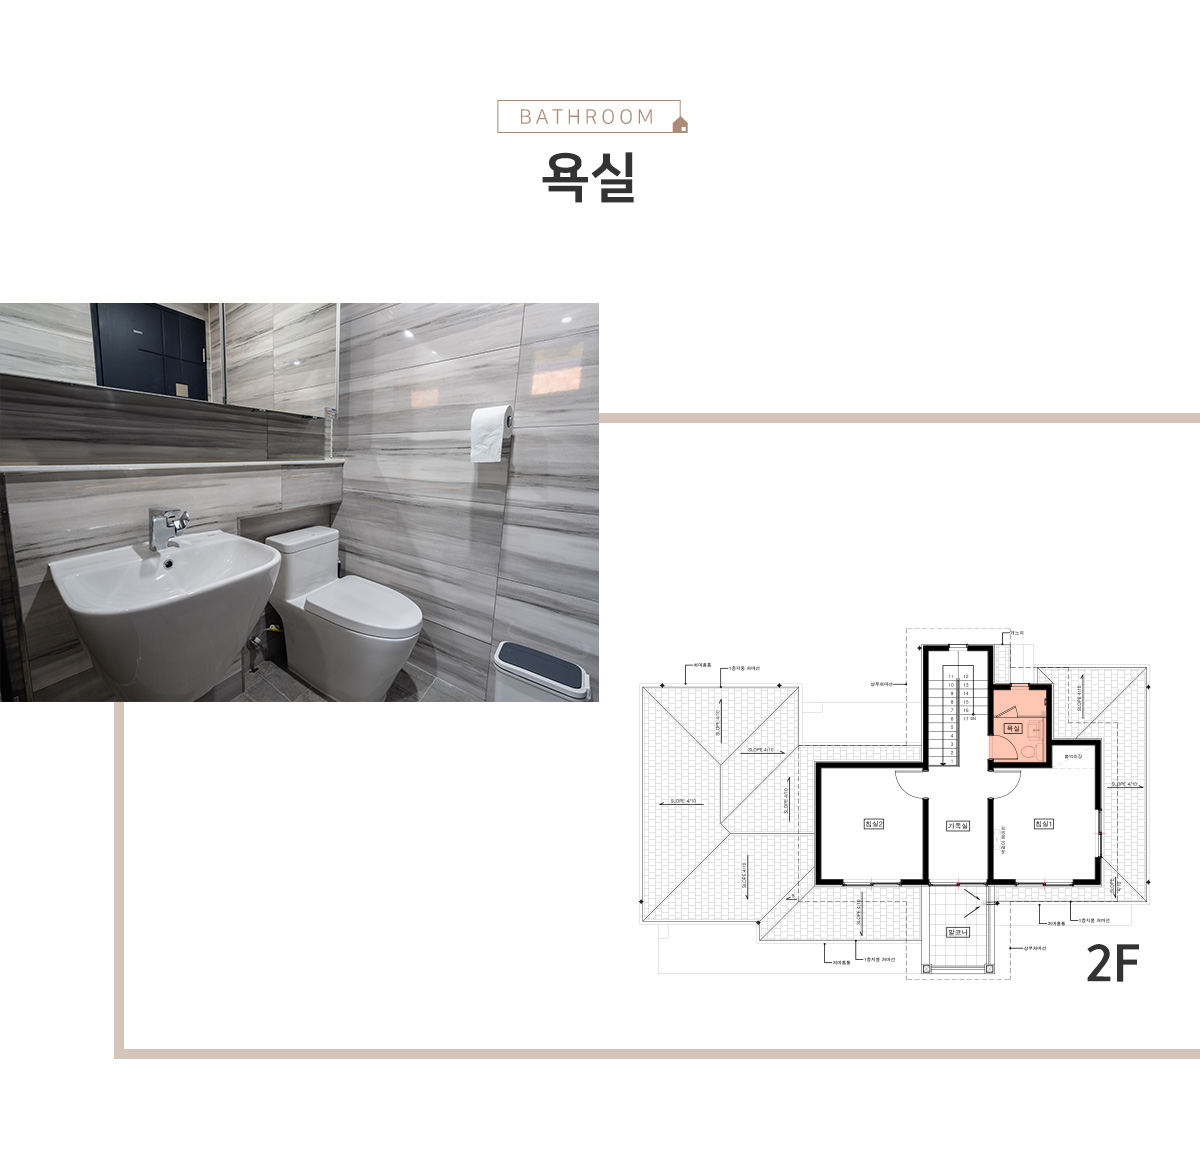 08_bathroom_충남서천_이00_01.jpg